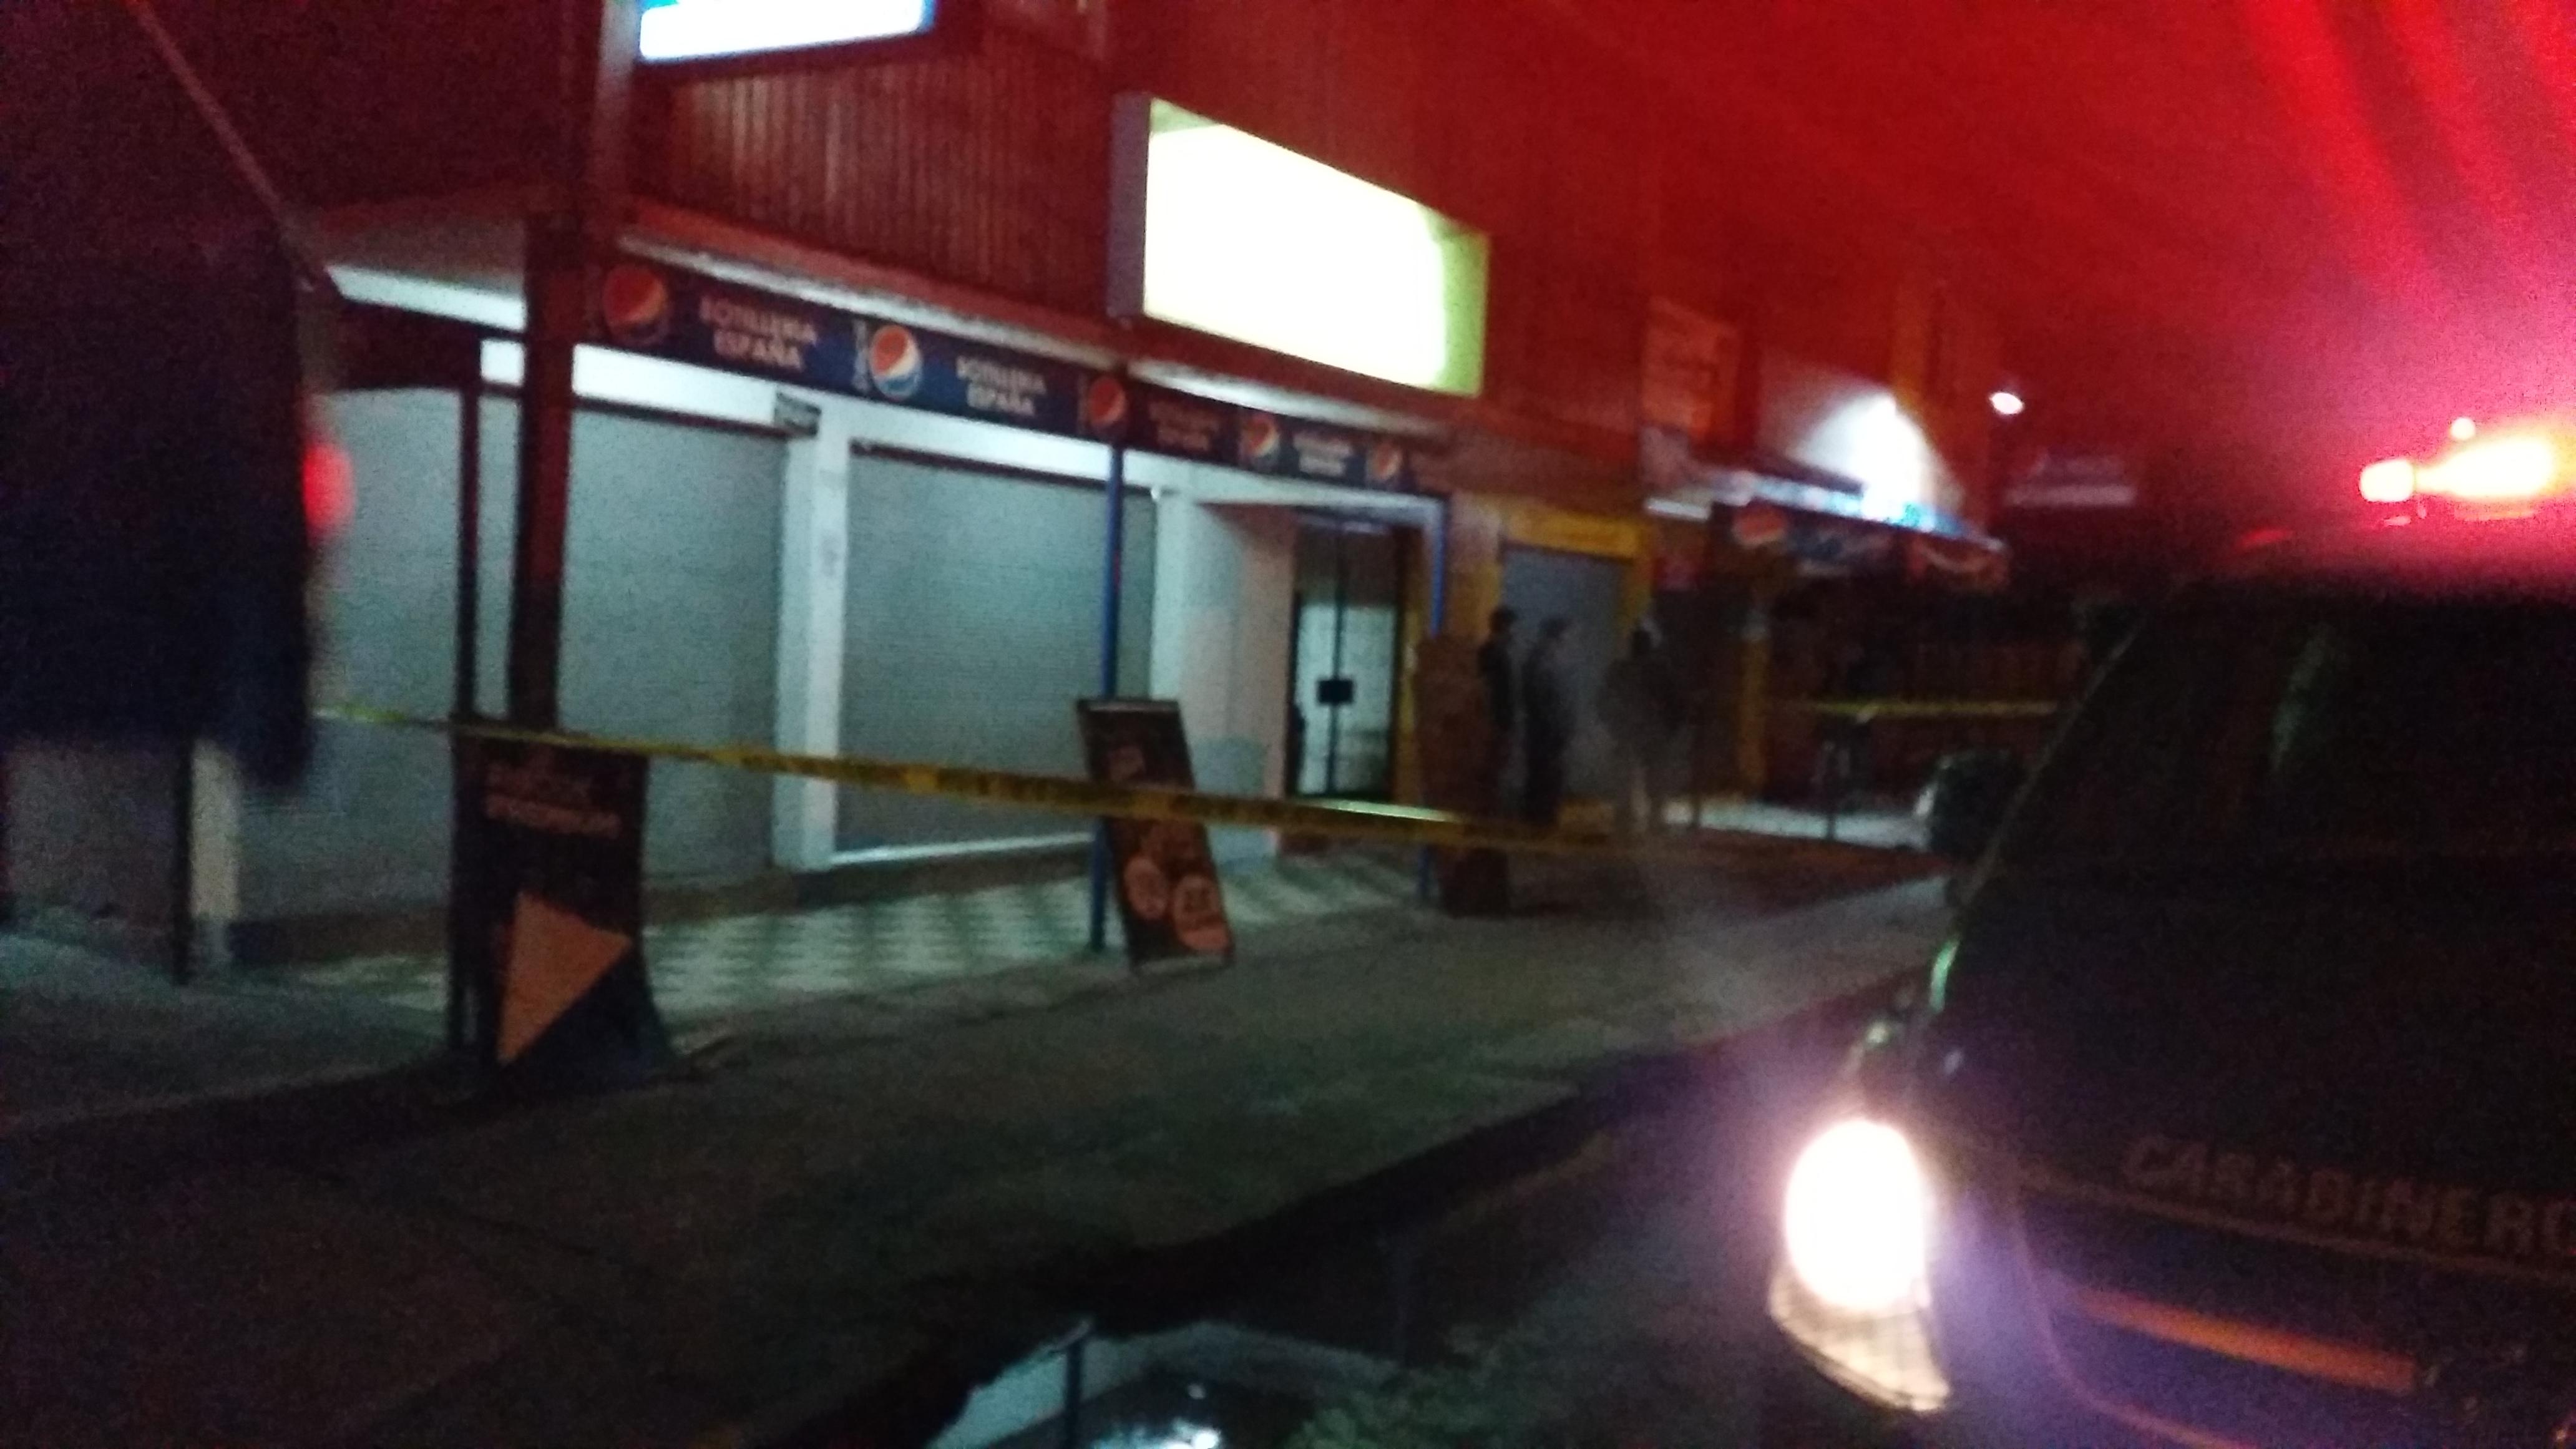 Violento asalto a mano armada, deja herida a bala a dueña de botillería en barrio Independencia de Talca.